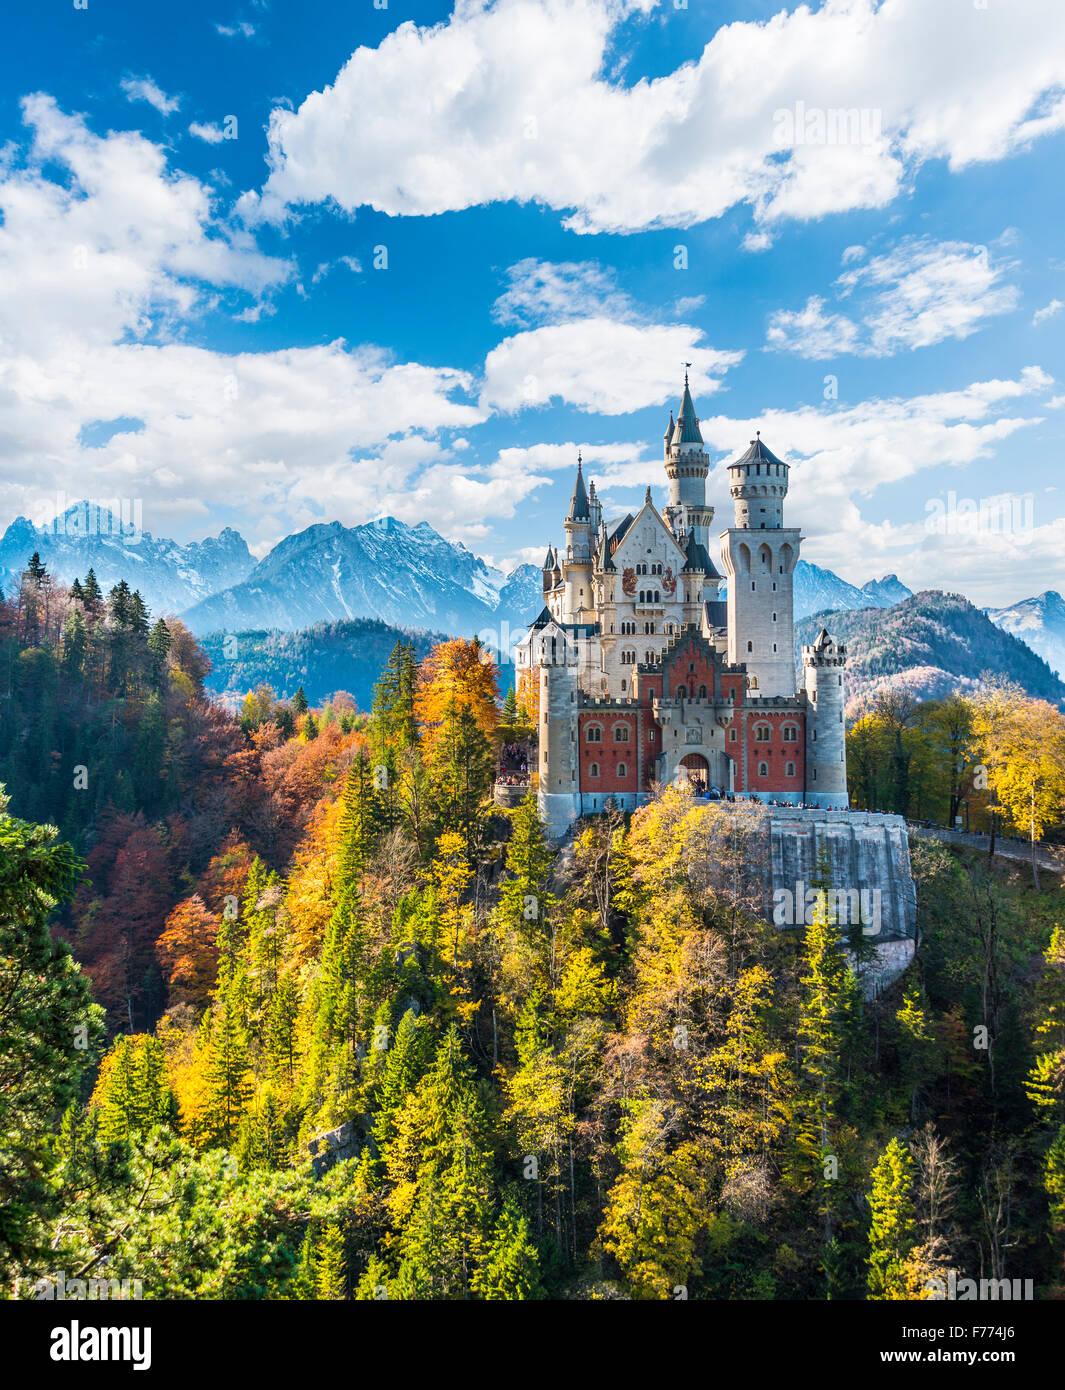 Il Castello di Neuschwanstein, Schwangau, Ostallgäu, Algovia, Svevia, Alta Baviera, Baviera, Germania Immagini Stock